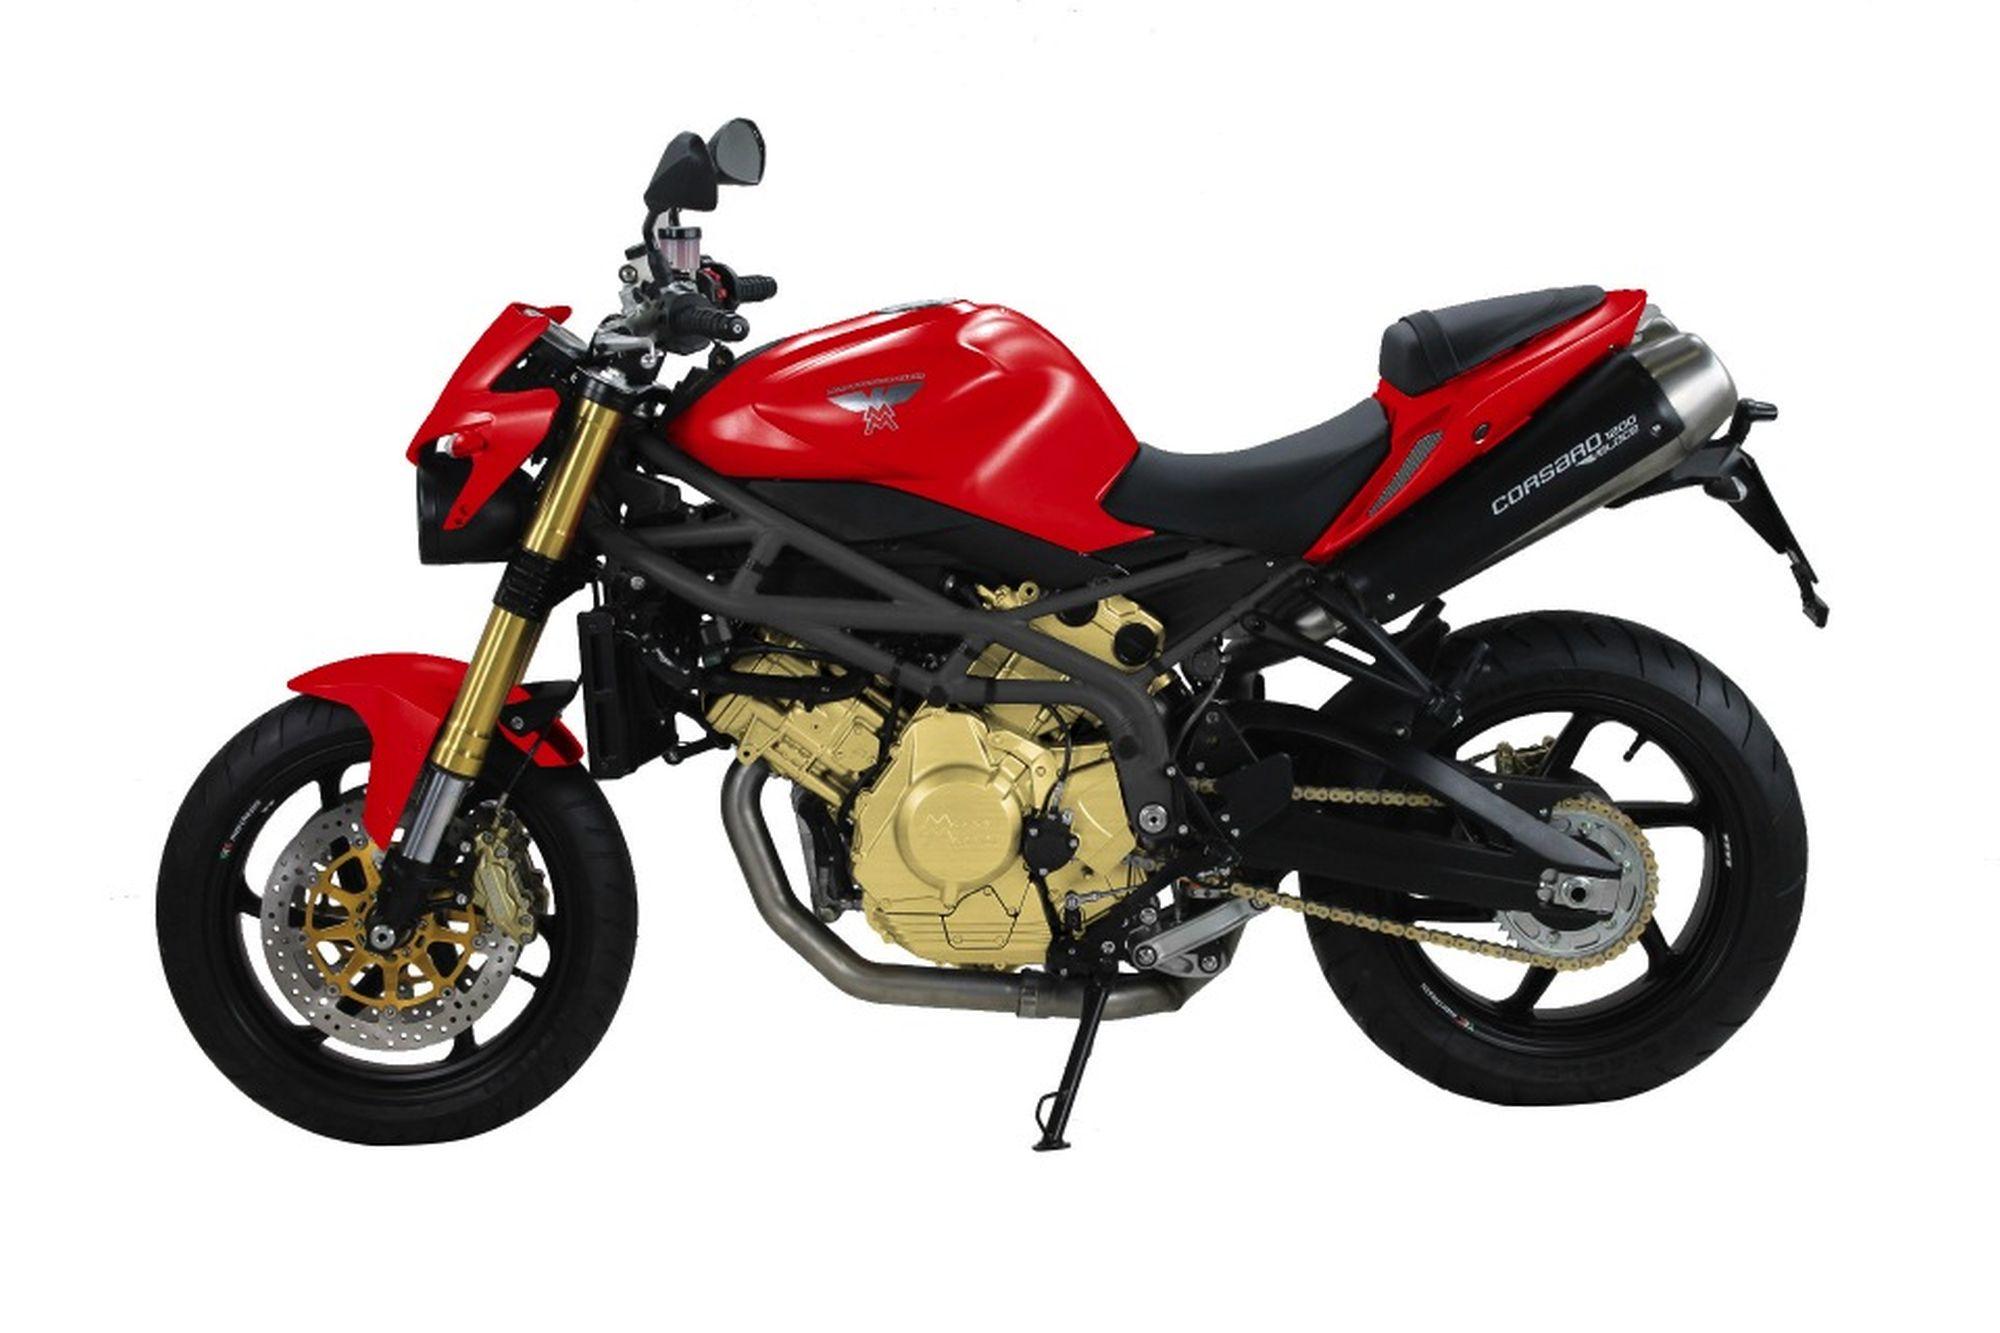 gebrauchte und neue moto morini corsaro 1200 veloce. Black Bedroom Furniture Sets. Home Design Ideas